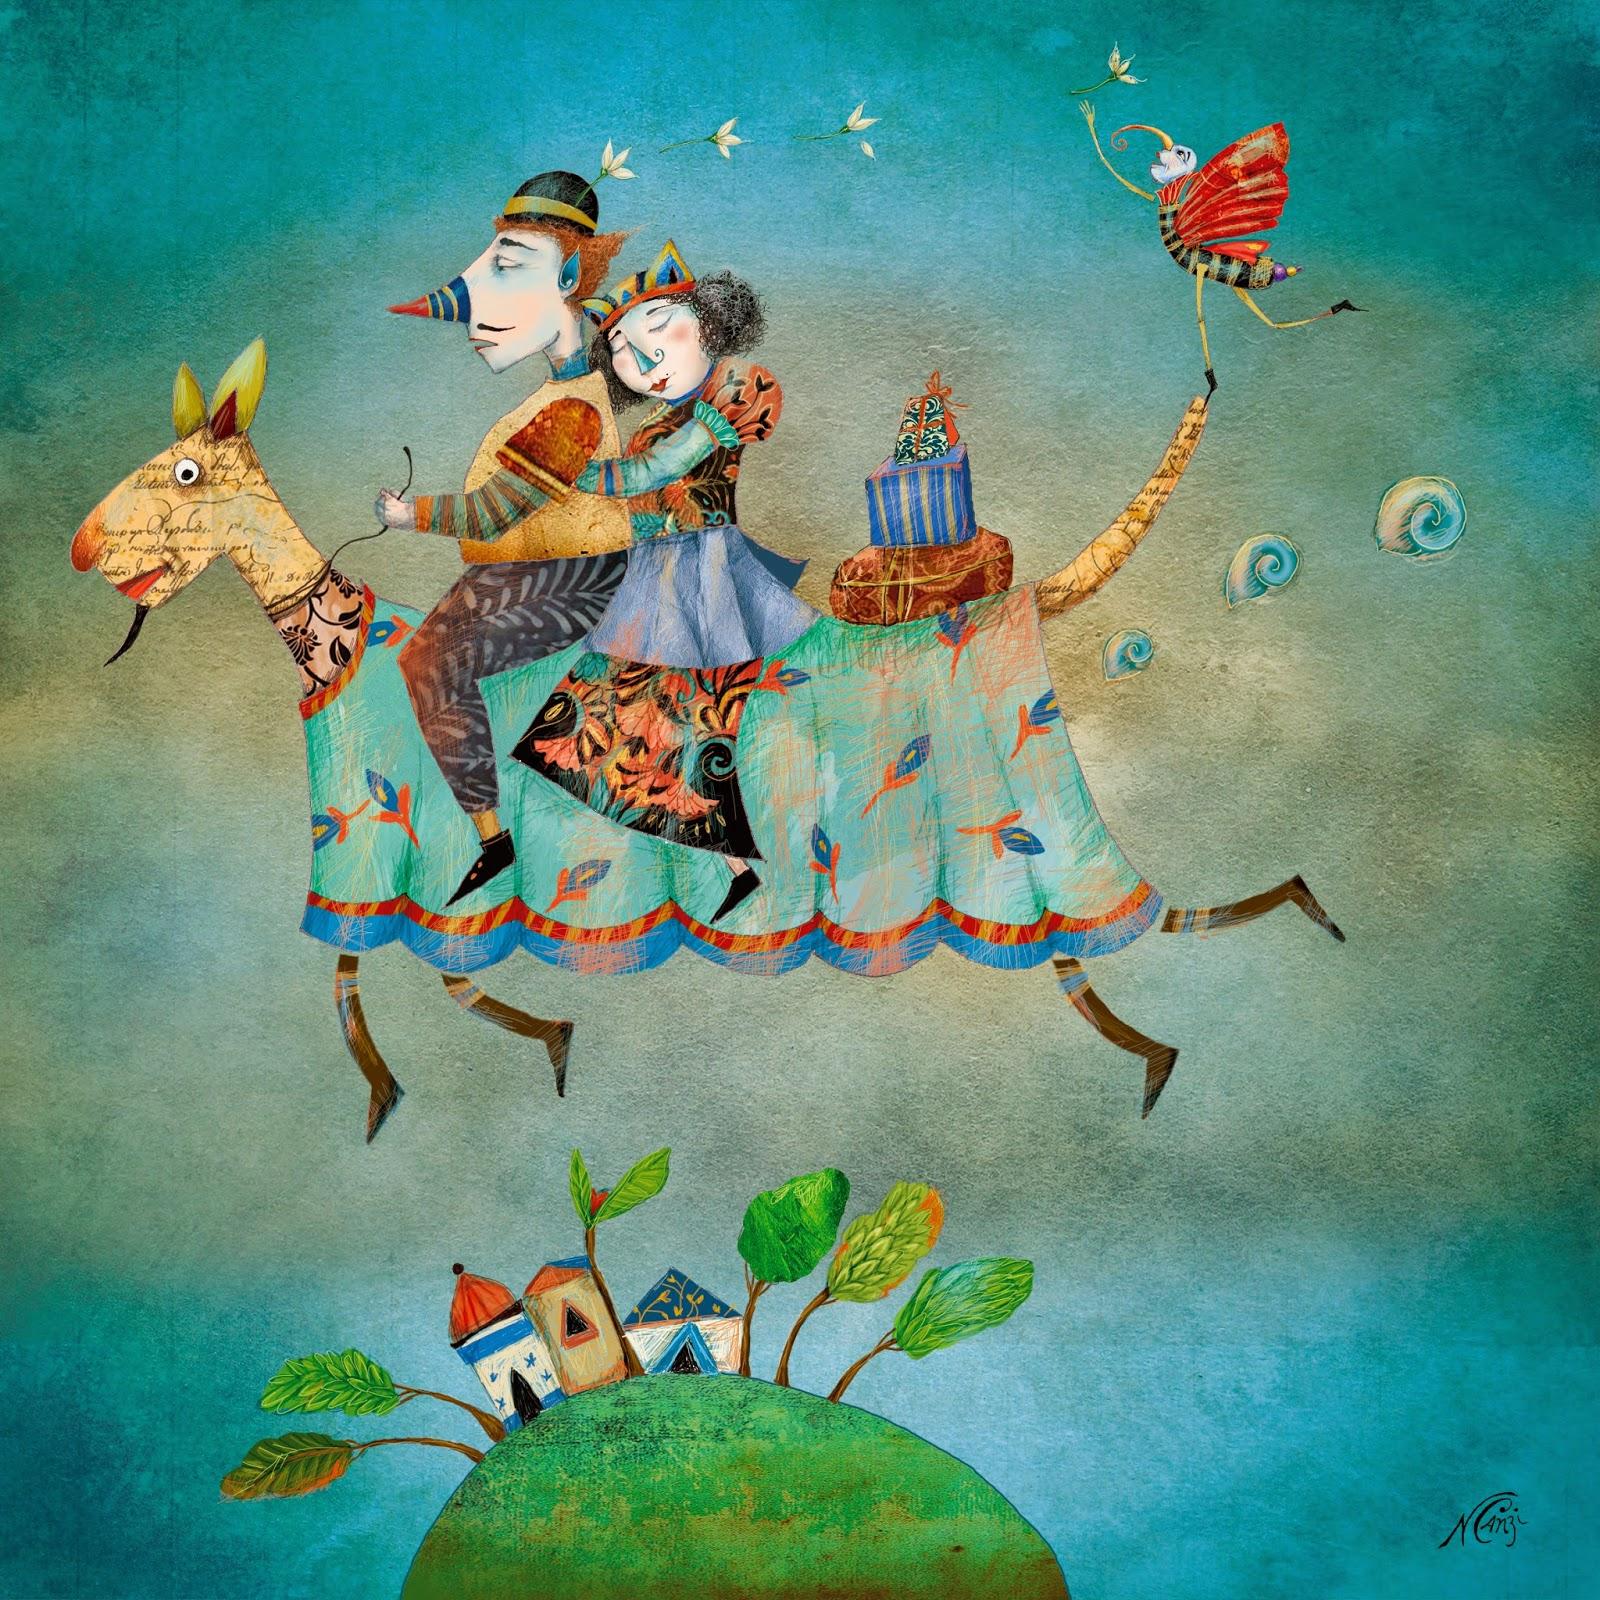 Nerina canzi ilustraciones viaje a mumpur - Ilustraciones infantiles antiguas ...